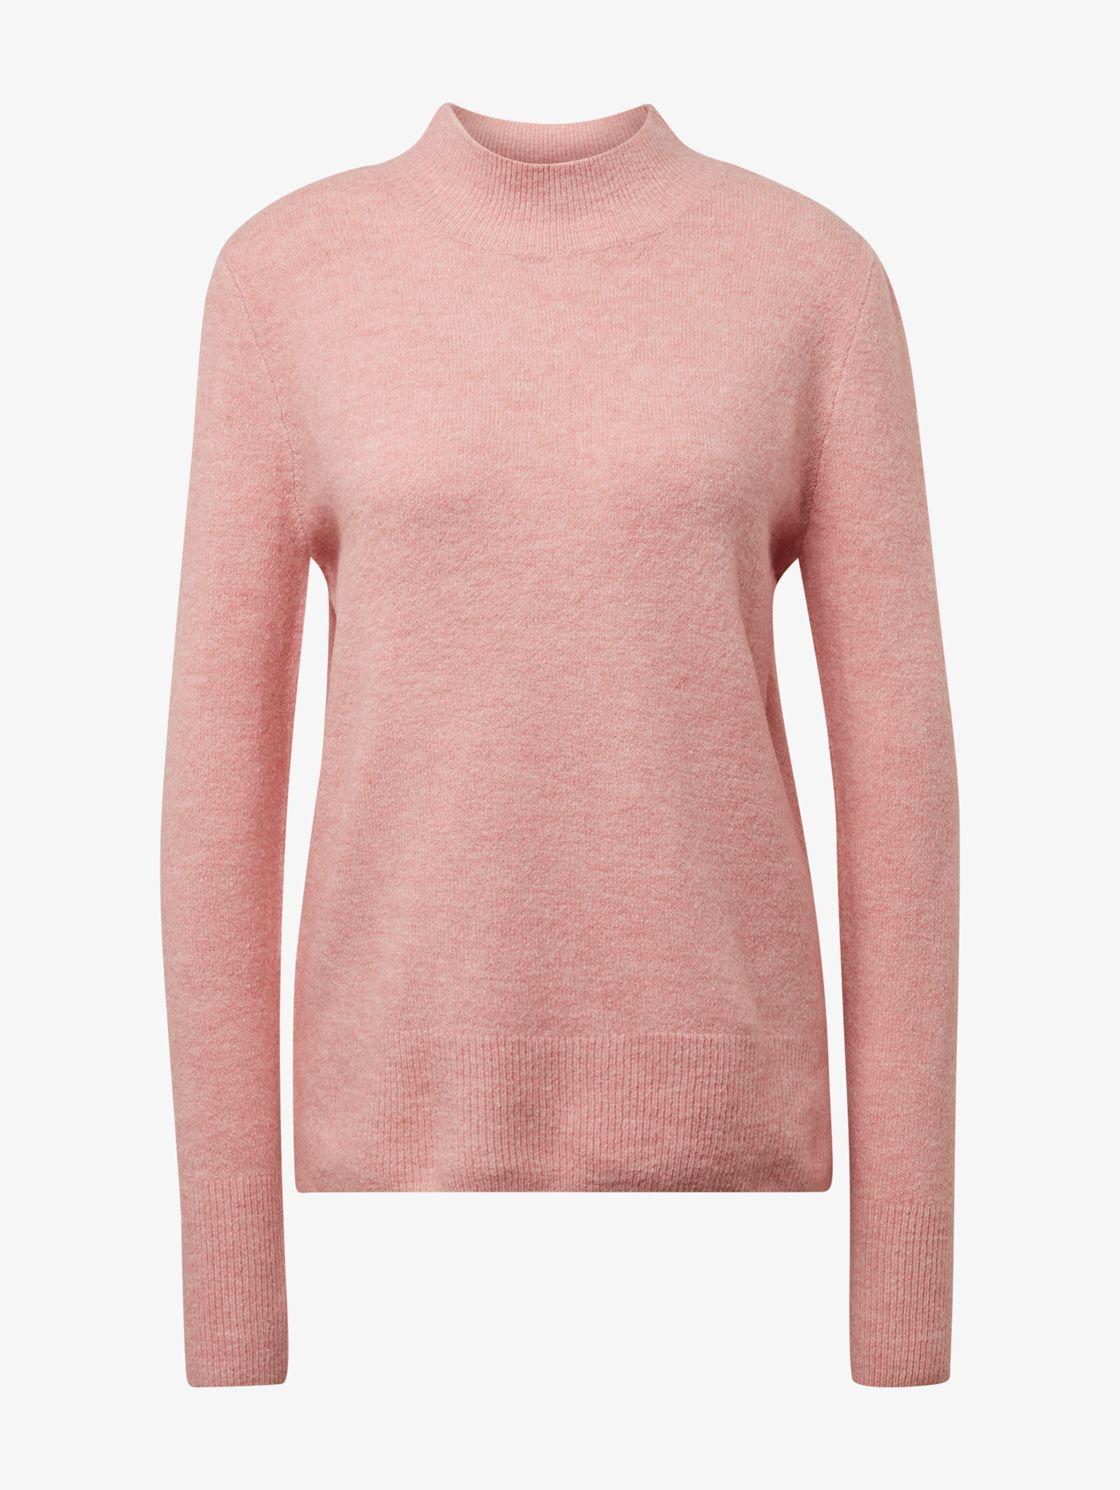 Пуловер 101255018927 фото